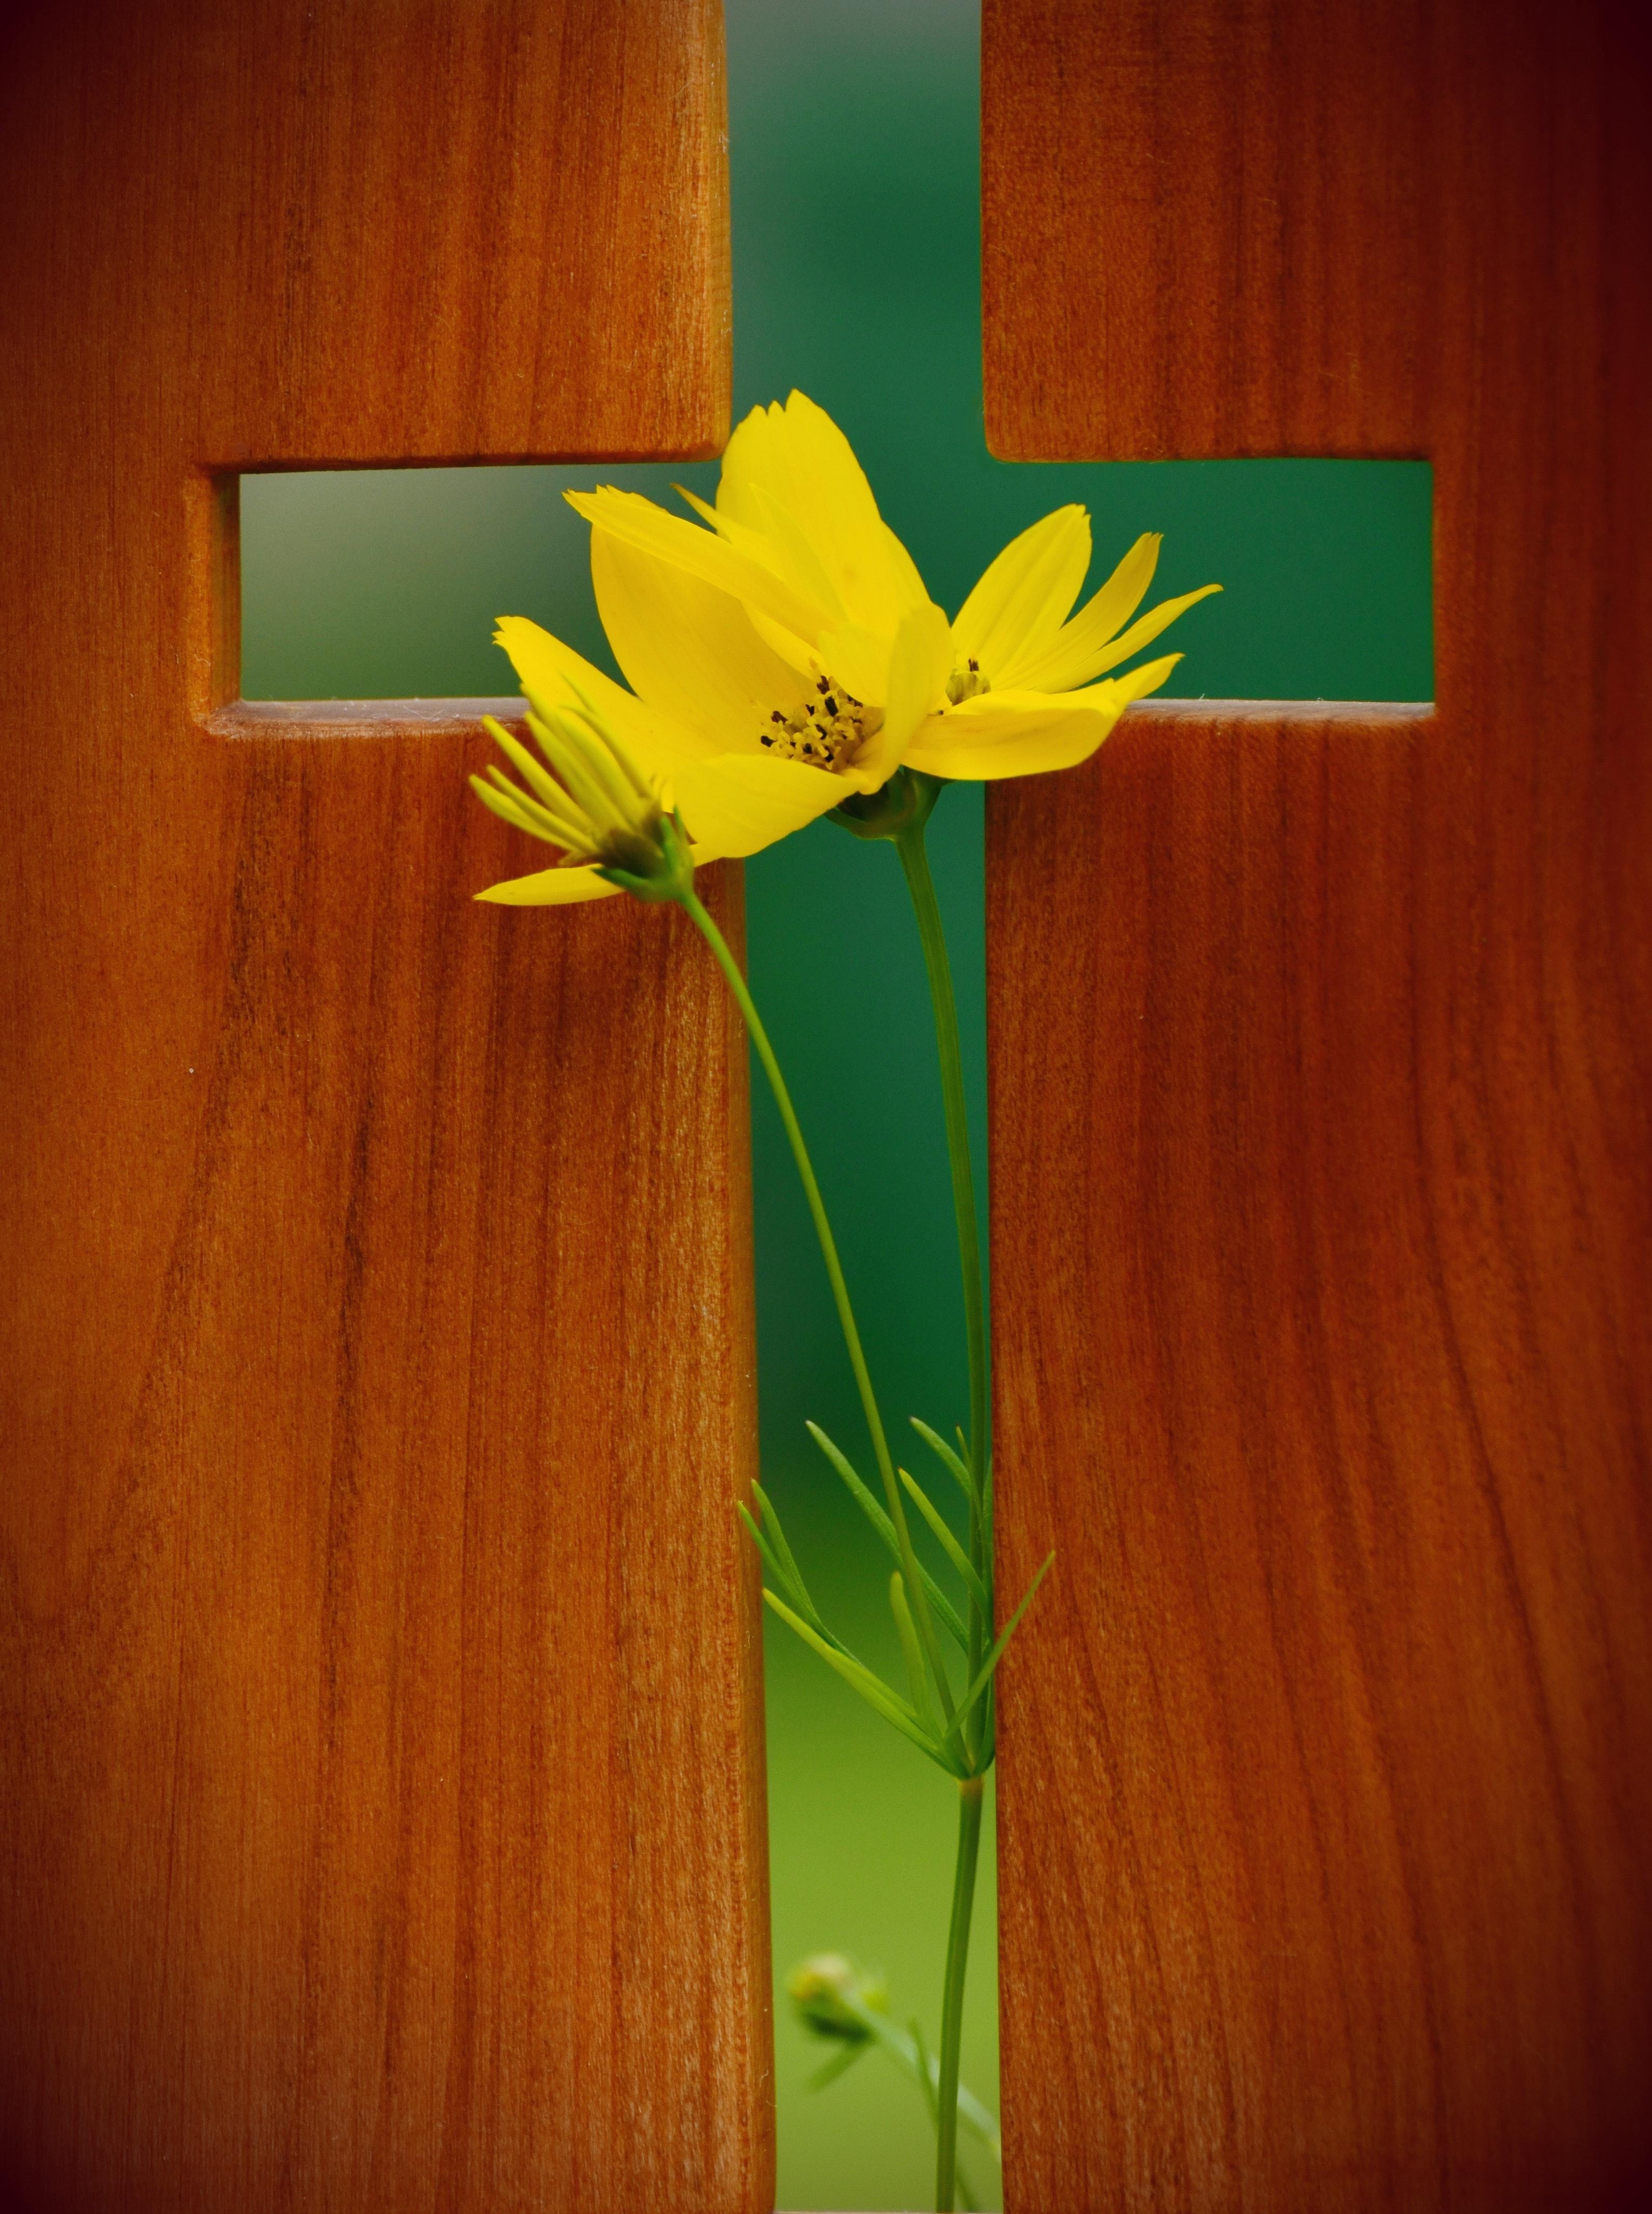 250 Beautiful Religious Photos Pexels Free Stock Photos: 250+ Engaging Cross Photos · Pexels · Free Stock Photos